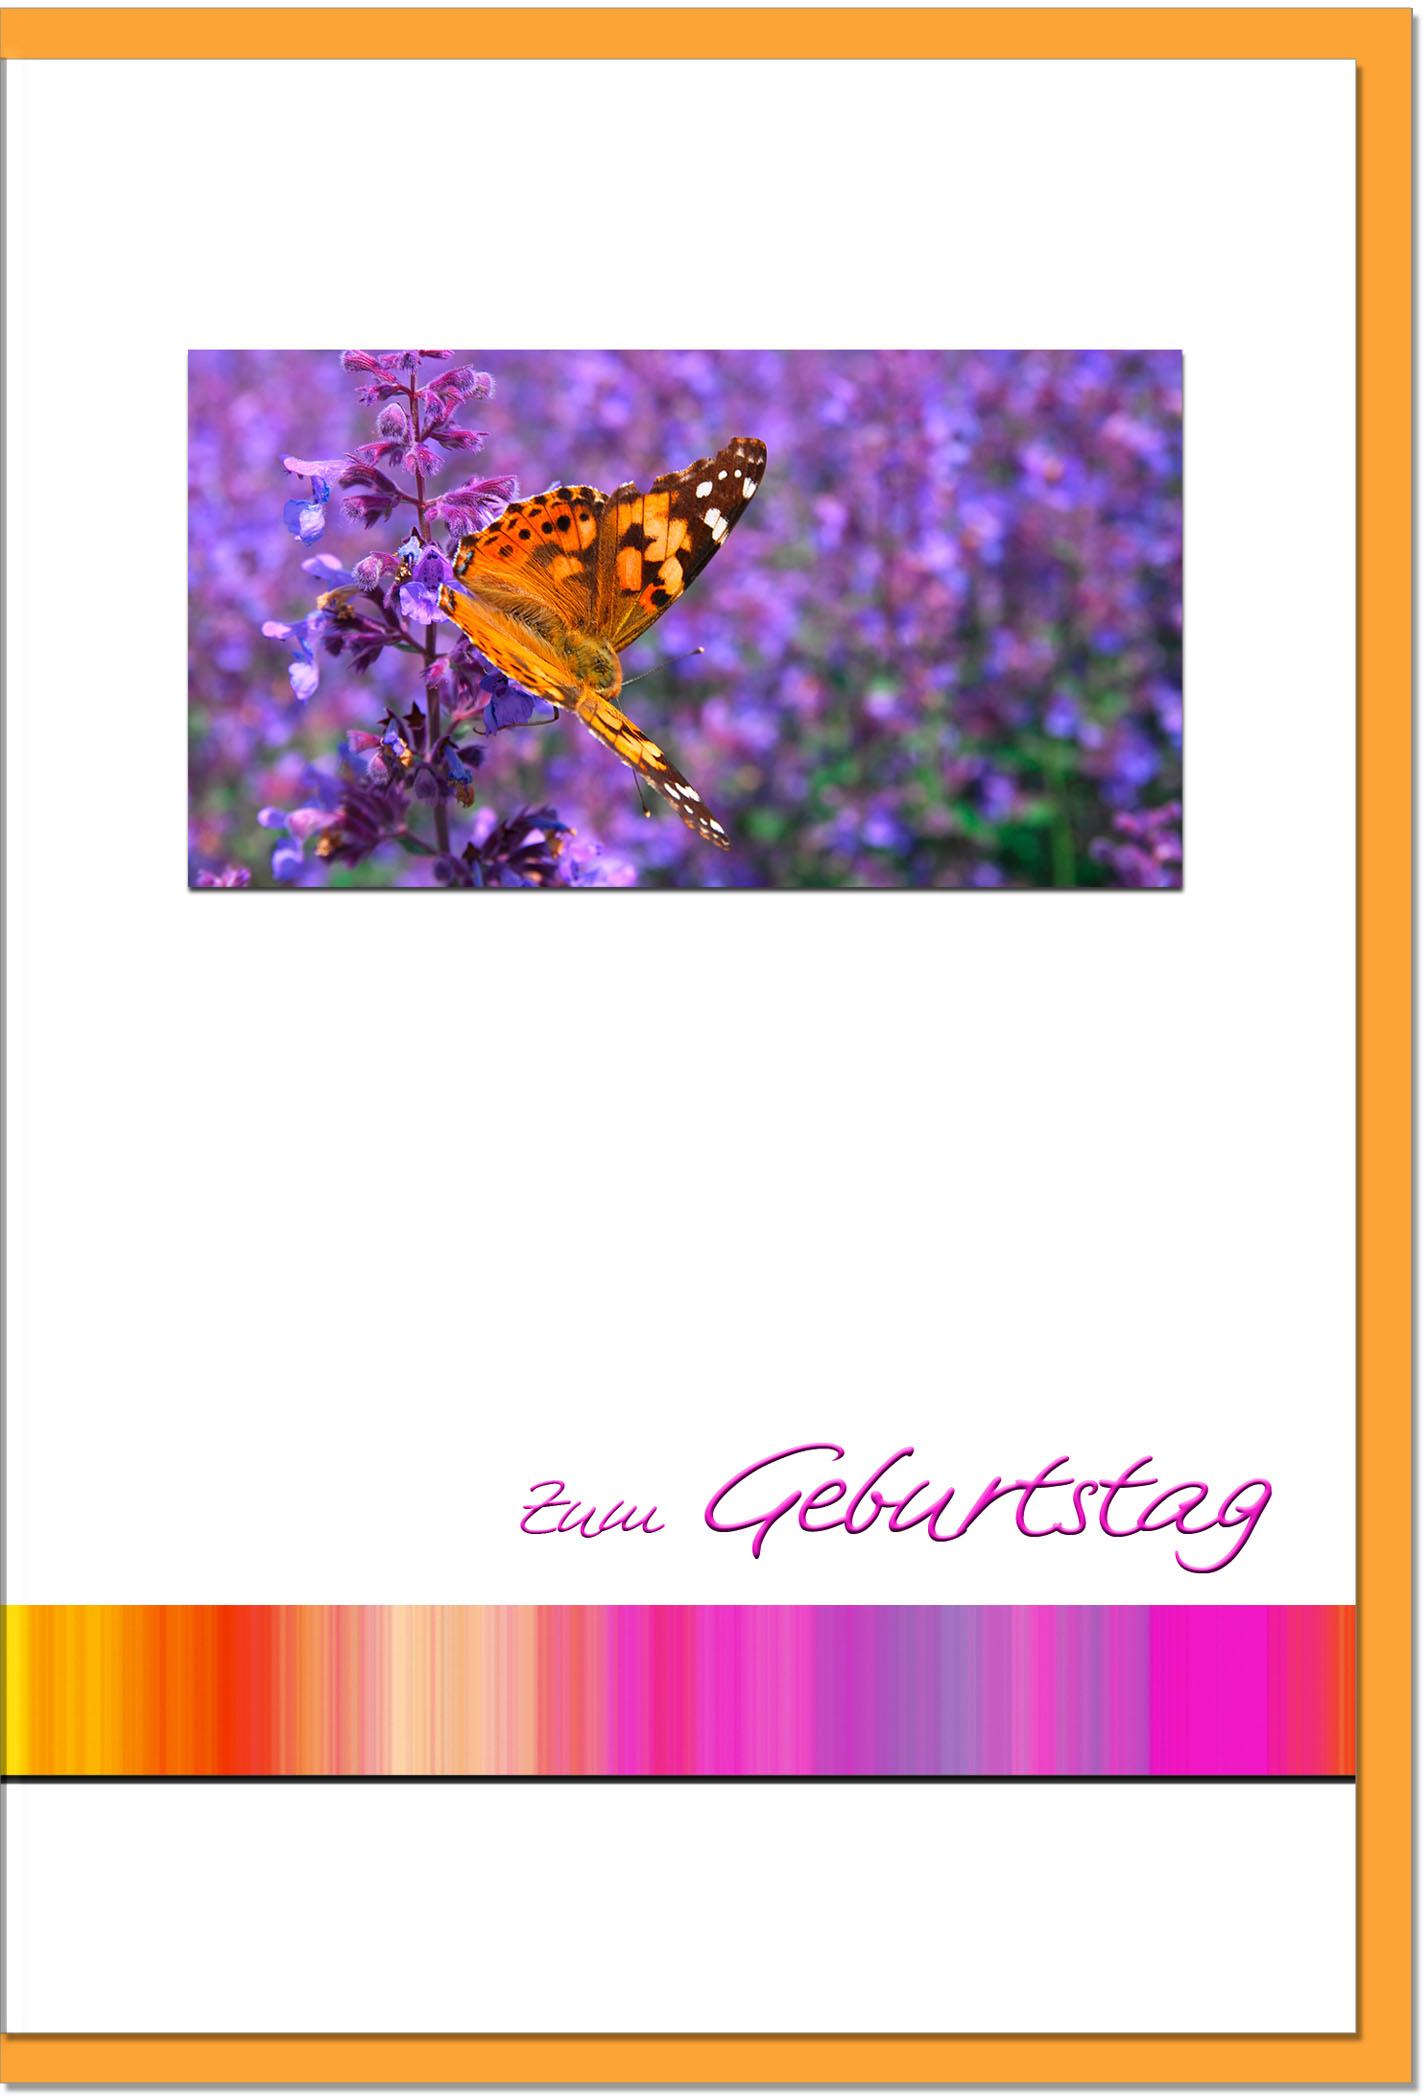 Geburtstagskarten / Grußkarten /Geburtstag Schmetterling